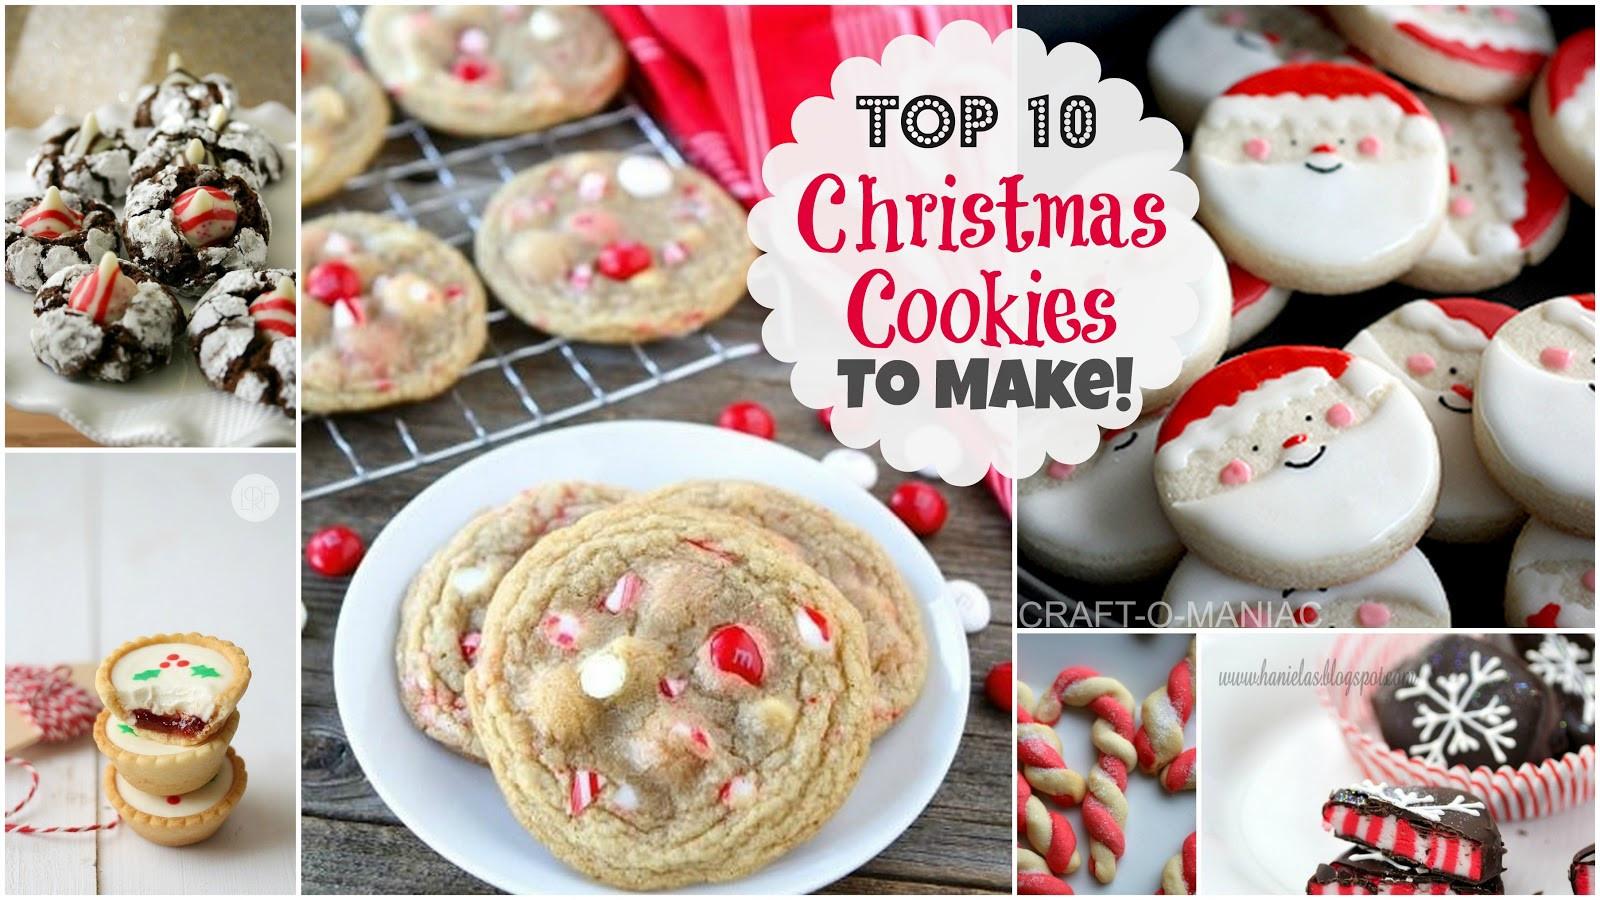 Top Ten Christmas Cookies  Top 10 Christmas Cookies to Make Craft O Maniac